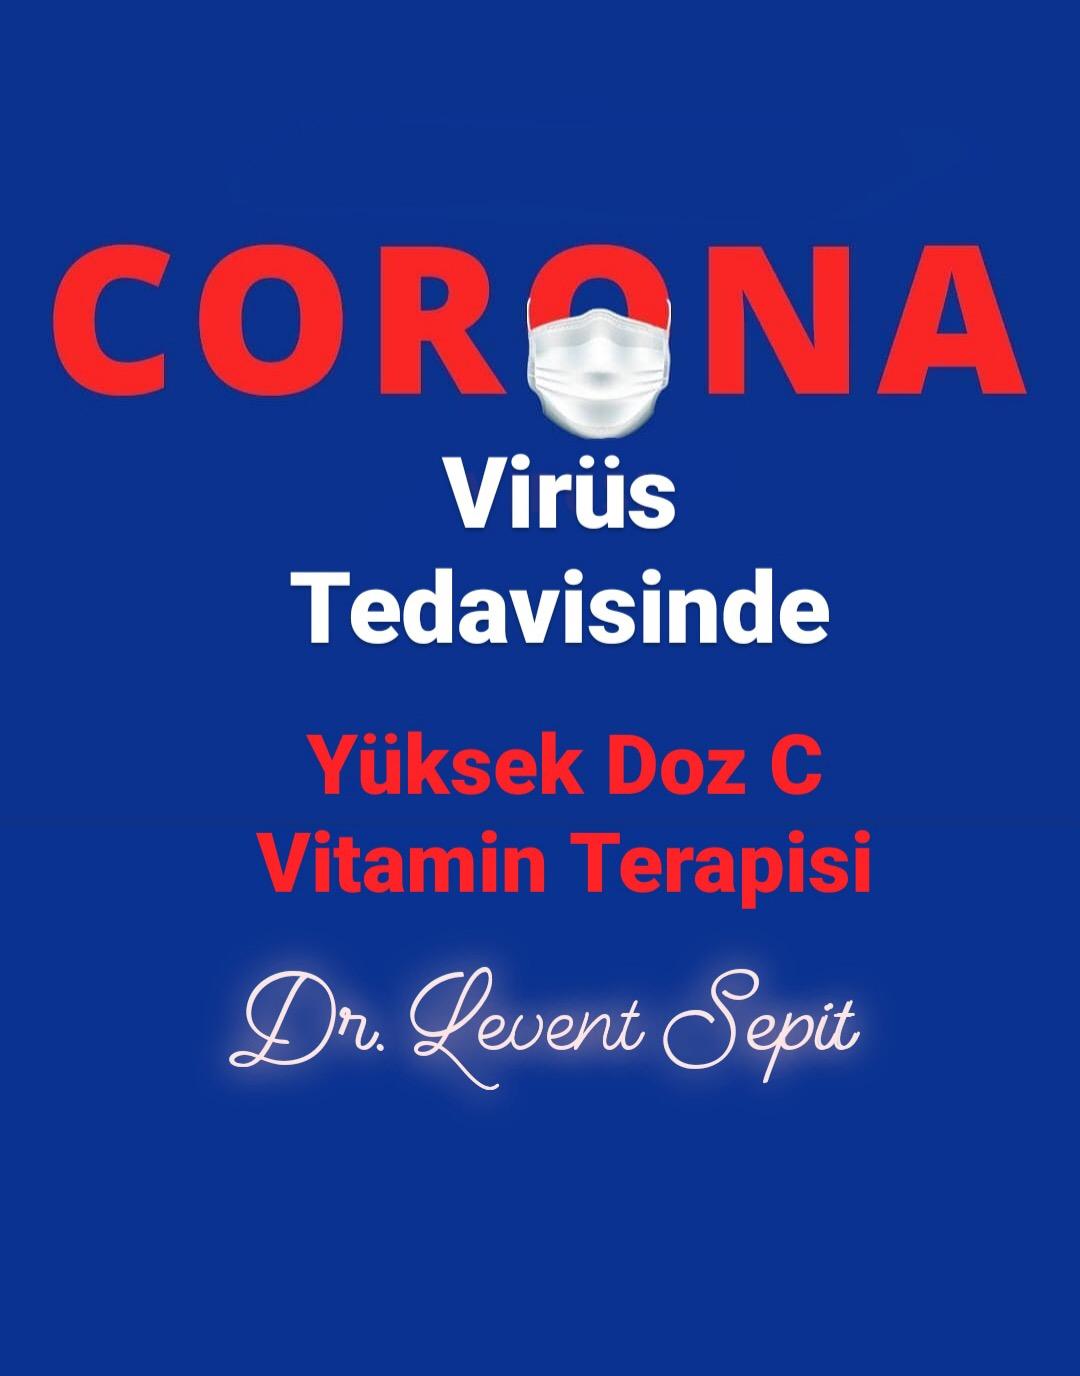 Coronavirus ve Yüksek Dozda C vitamini